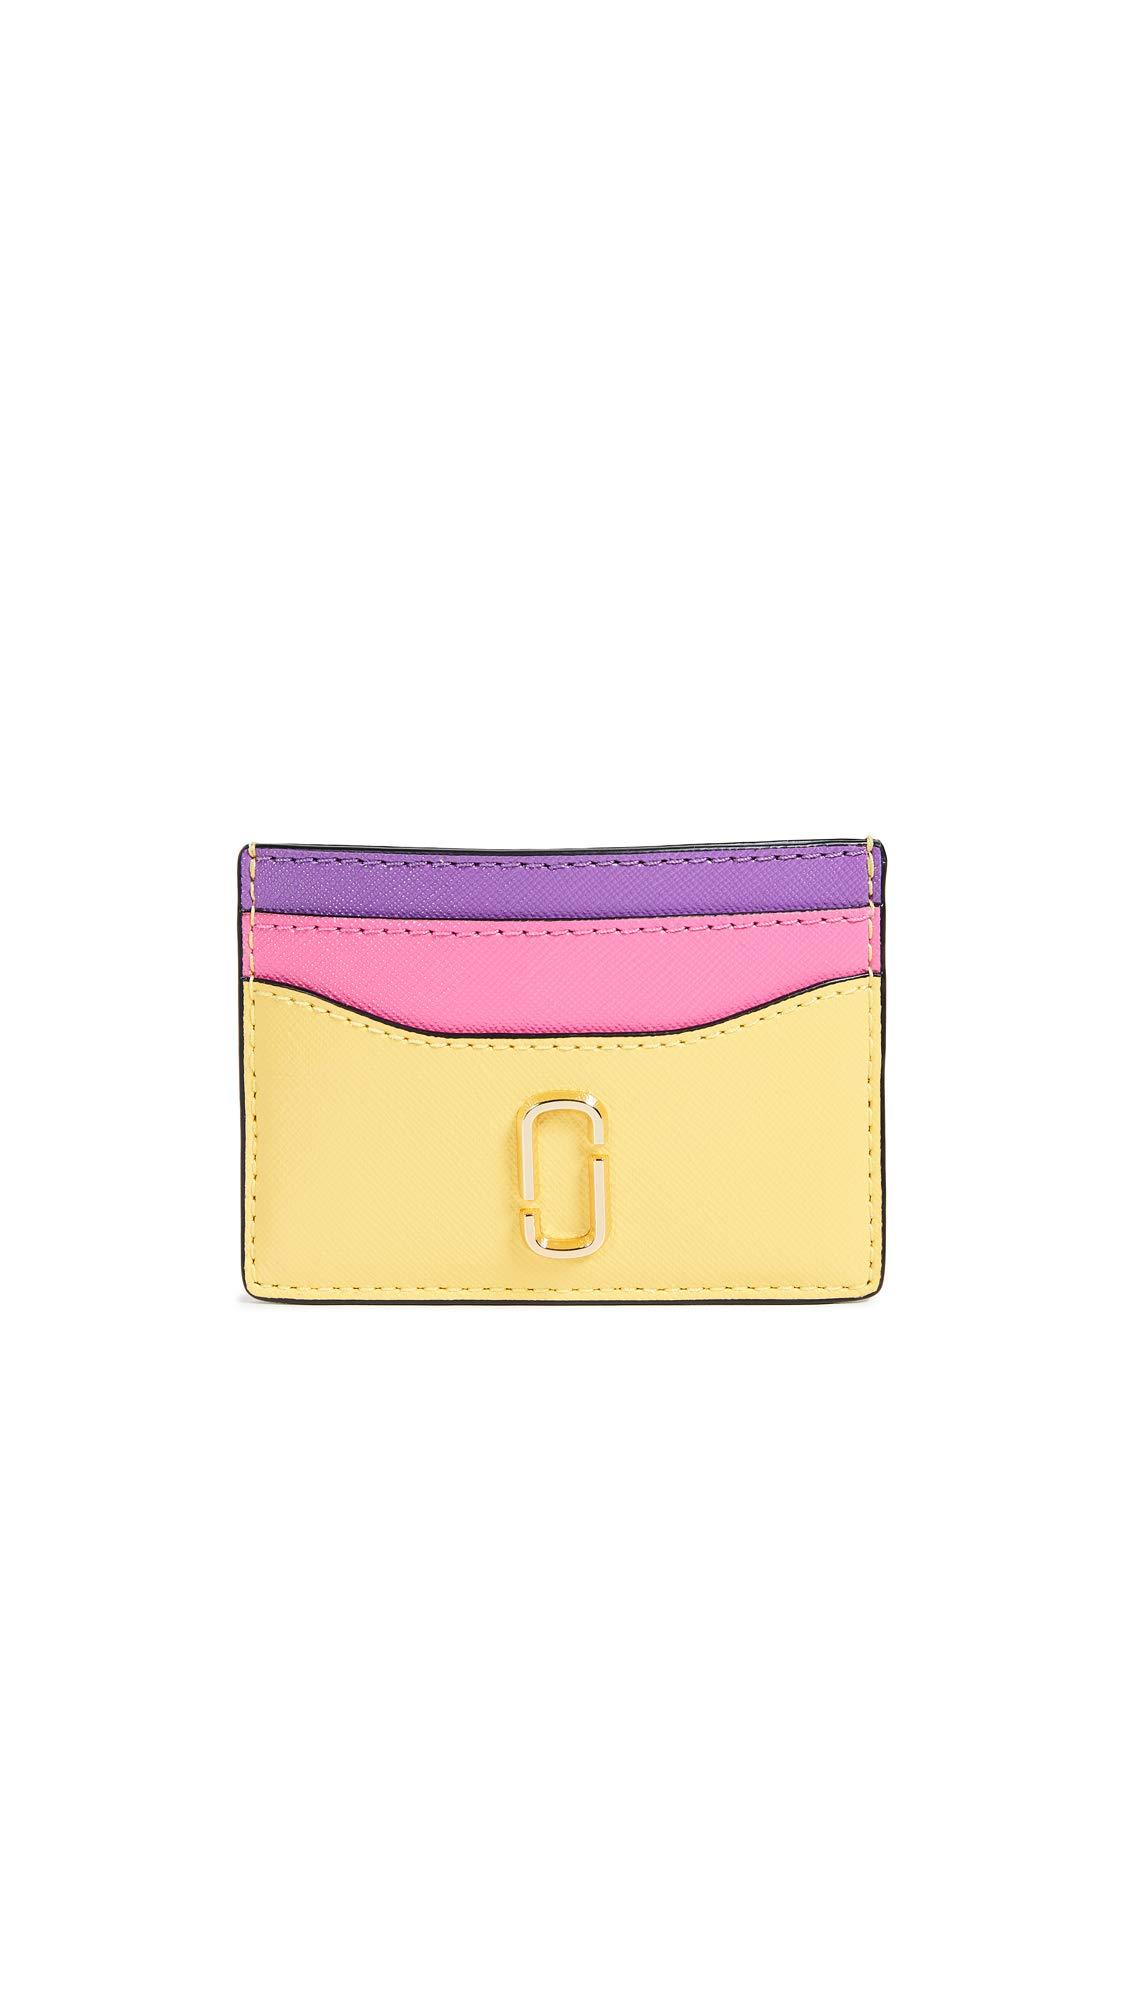 Marc Jacobs Women's Snapshot Card Case, Lemon Multi, One Size